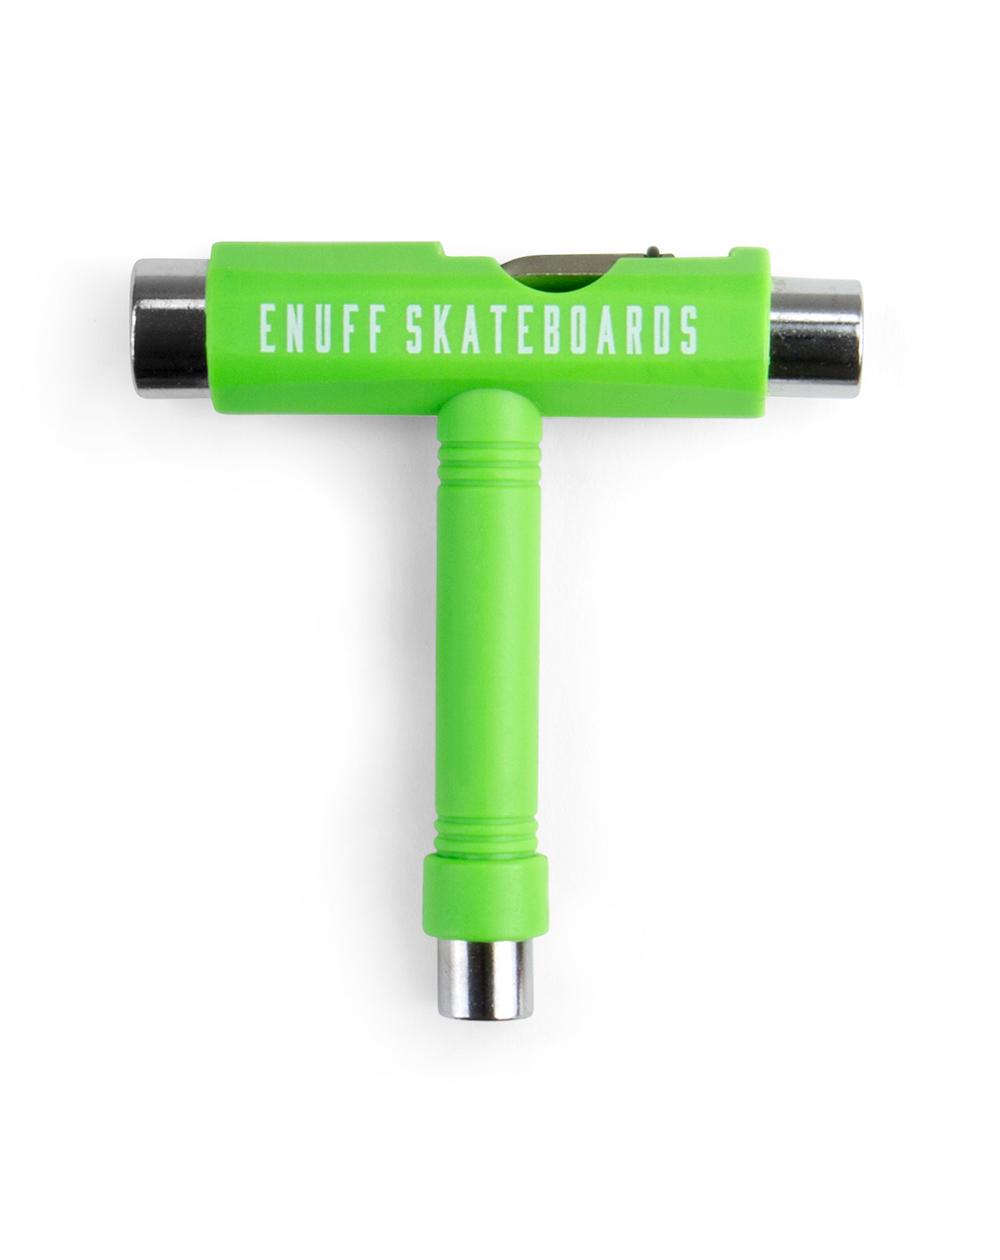 Enuff Essential Tool Skateboard Tool Green